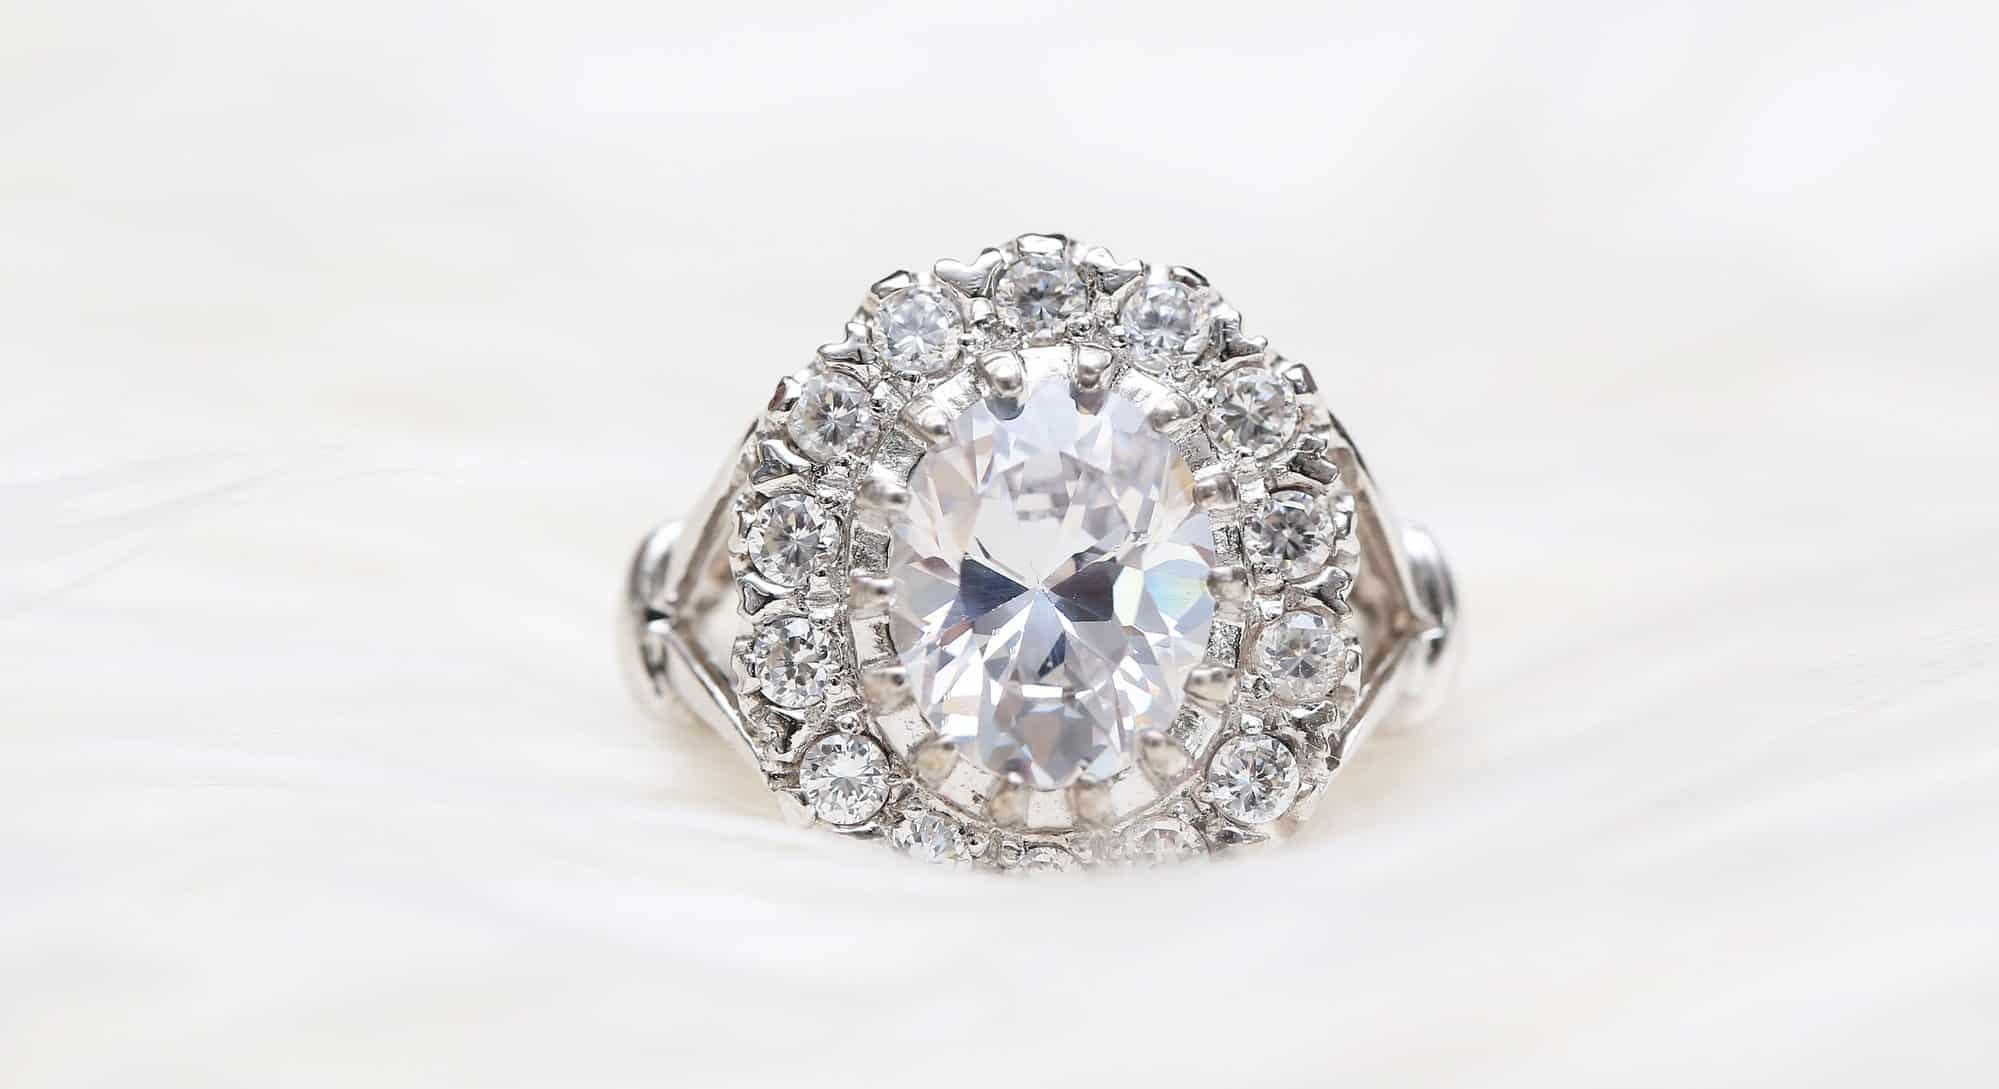 Halo Ring Meaning Shira Diamonds E1611293711752, Shira Diamonds